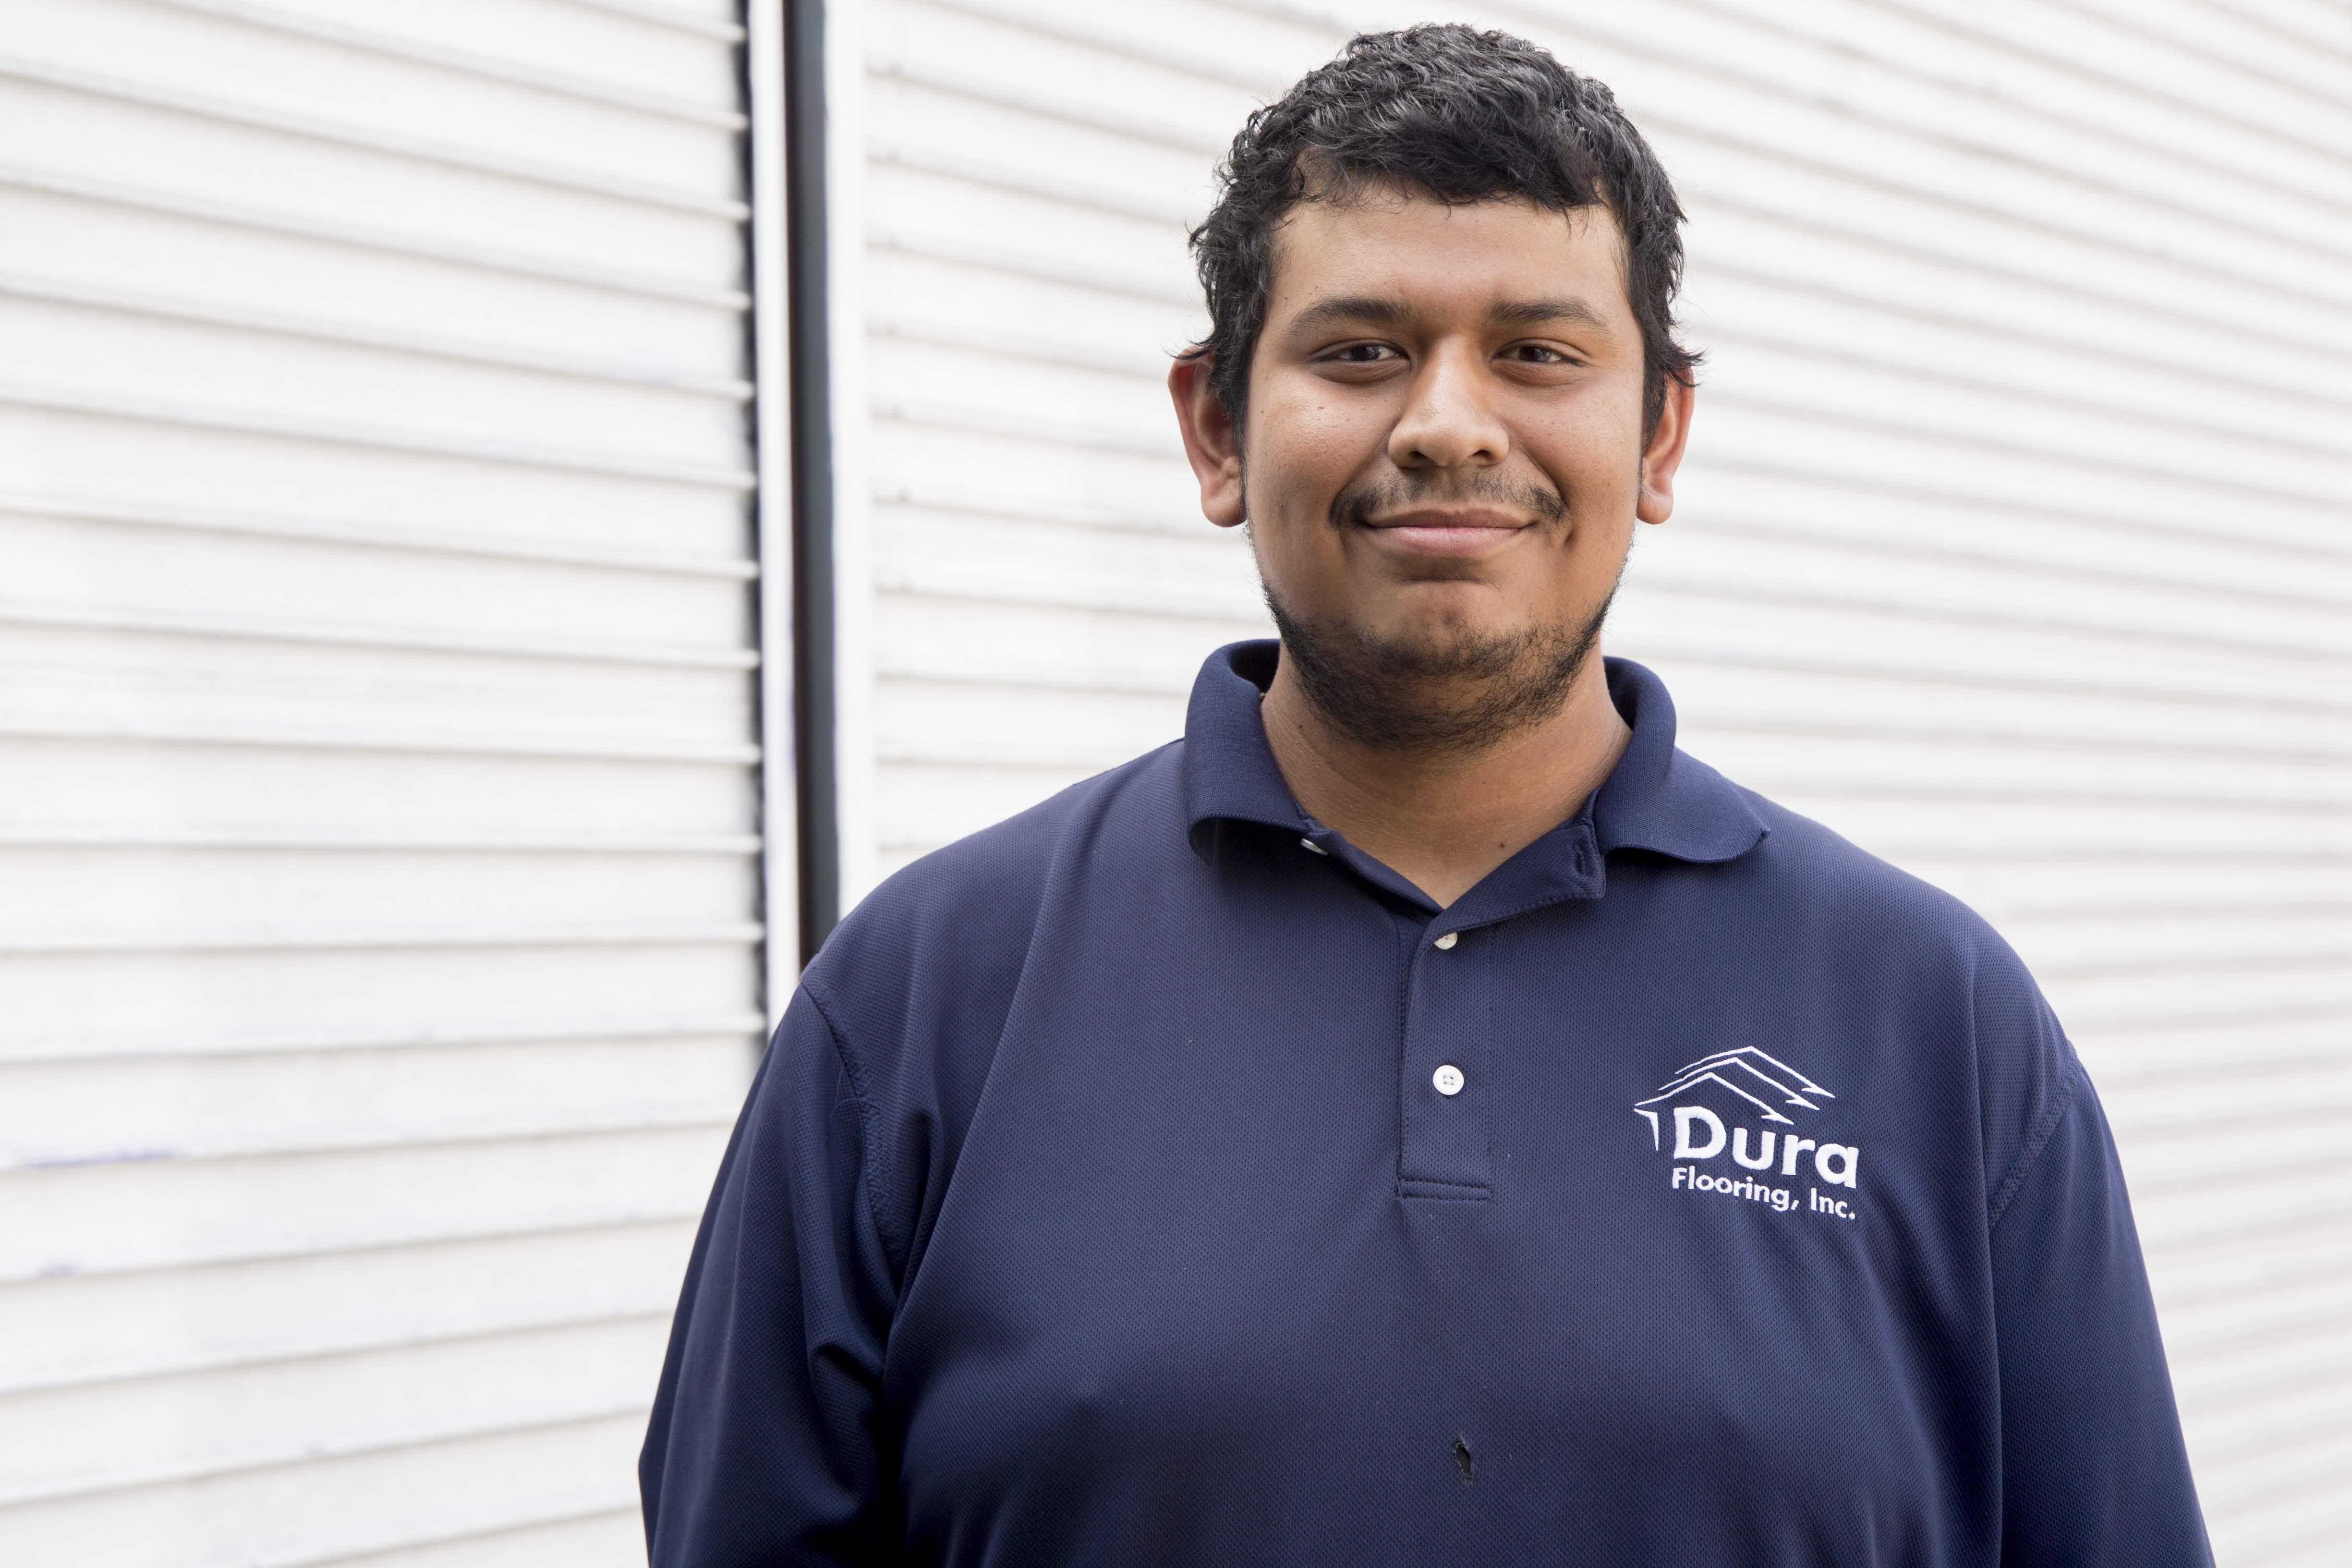 Edgar, Warehouse Driver at Dura Flooring, Inc